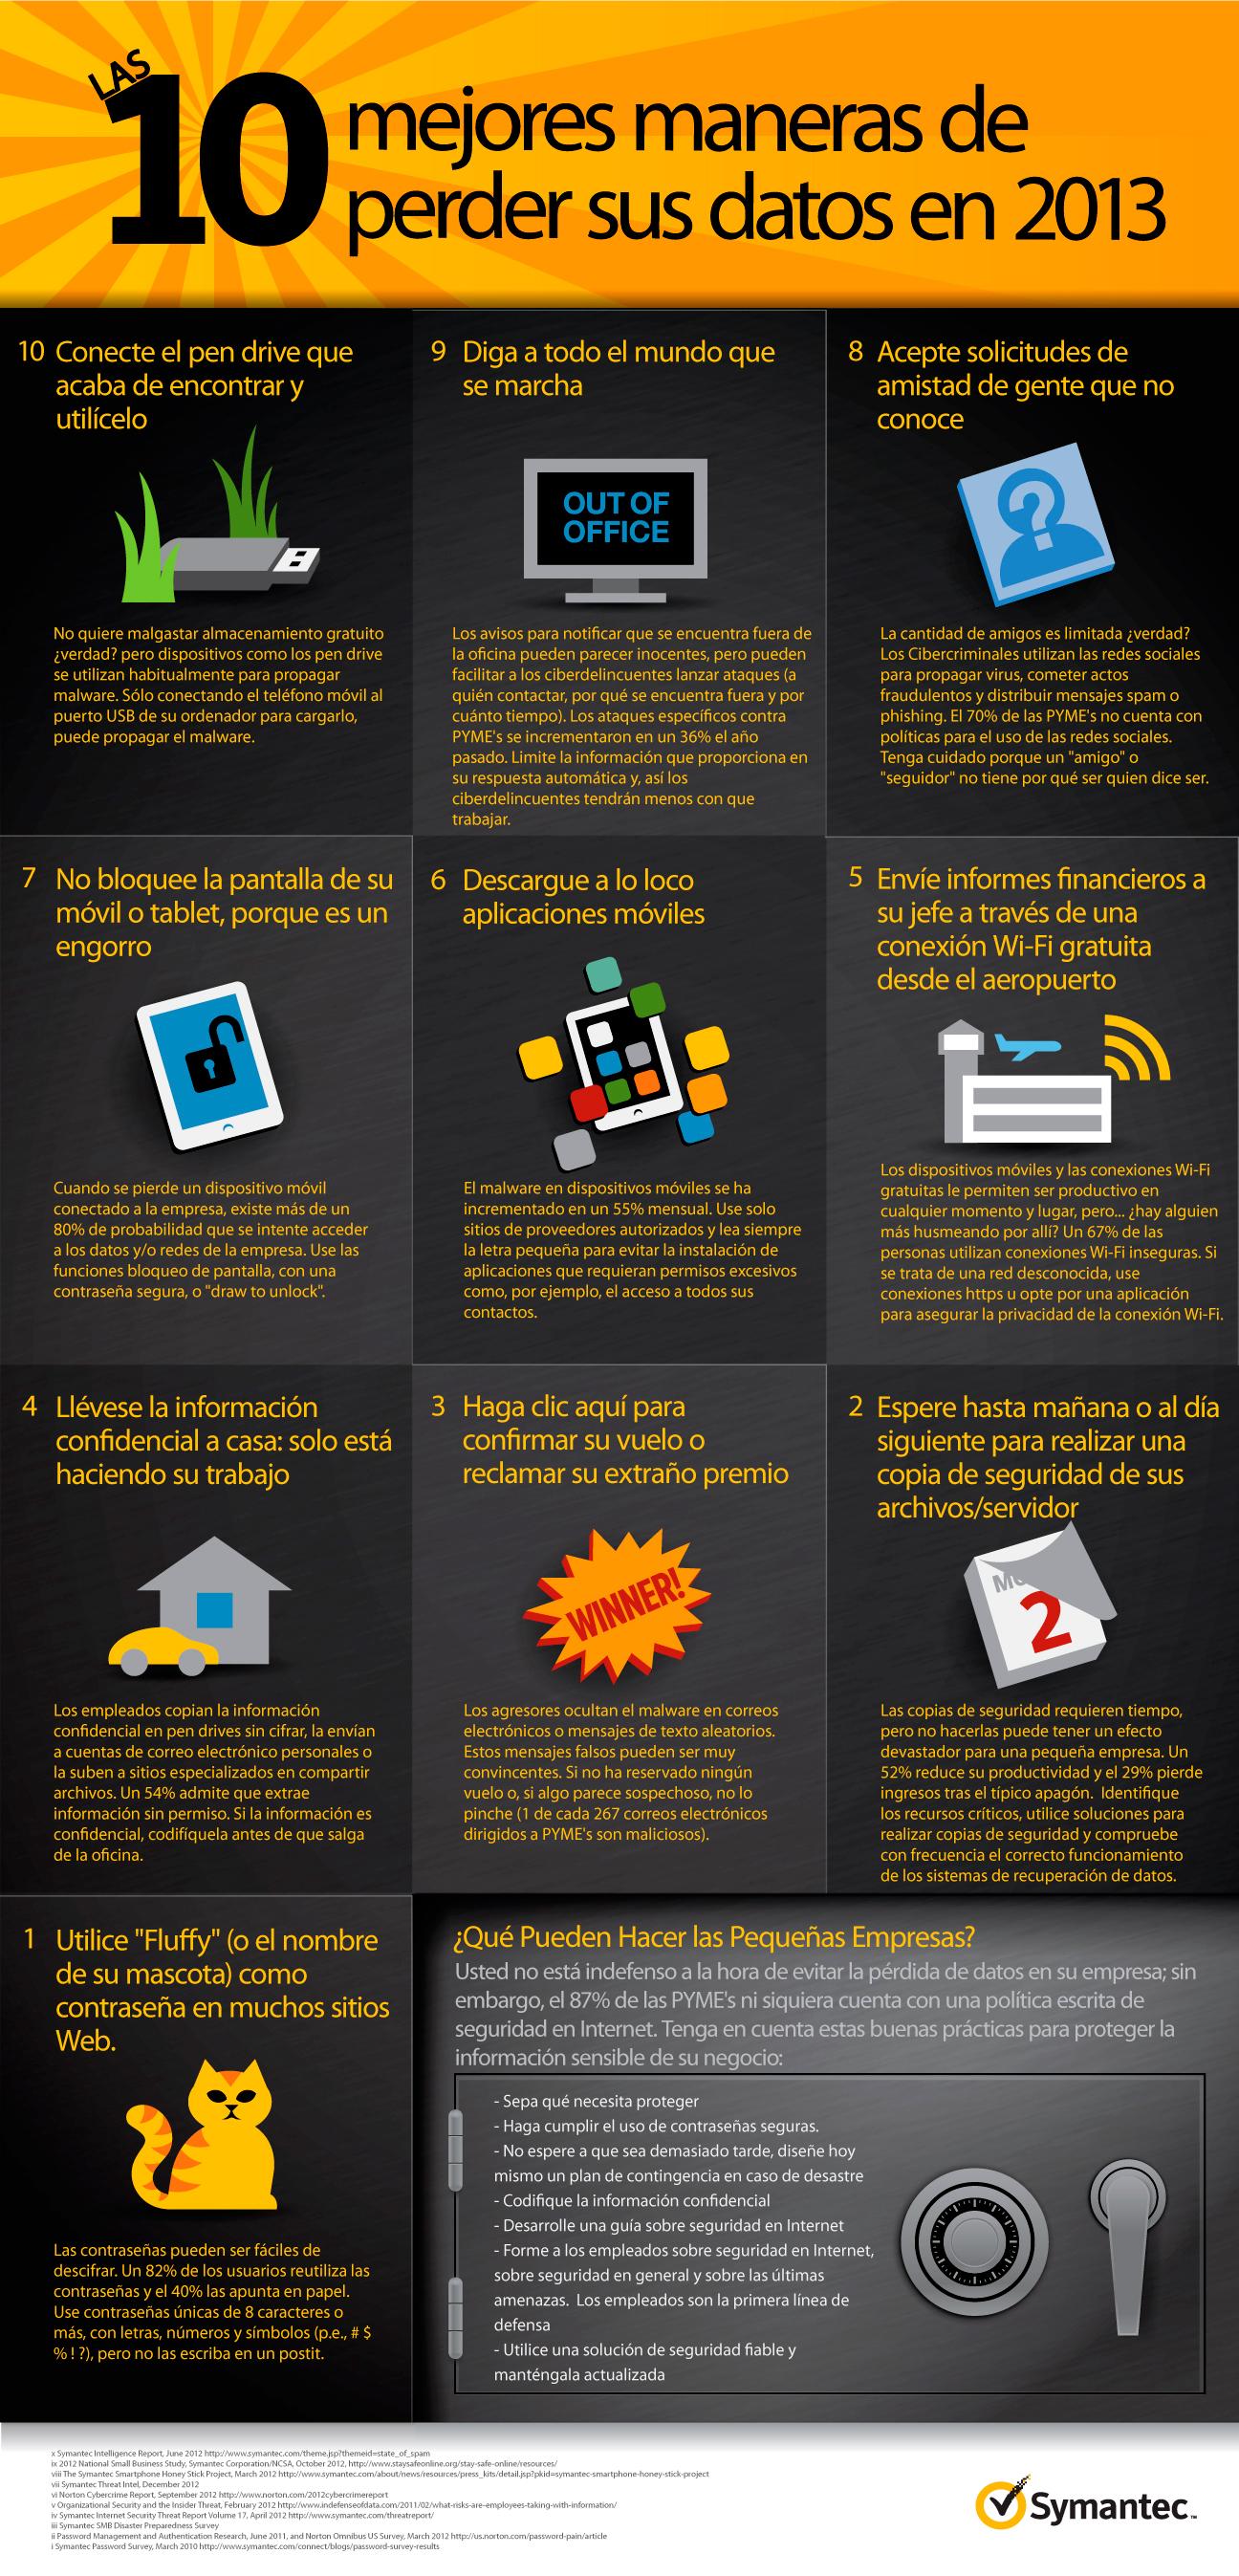 10 maneras de perder datos